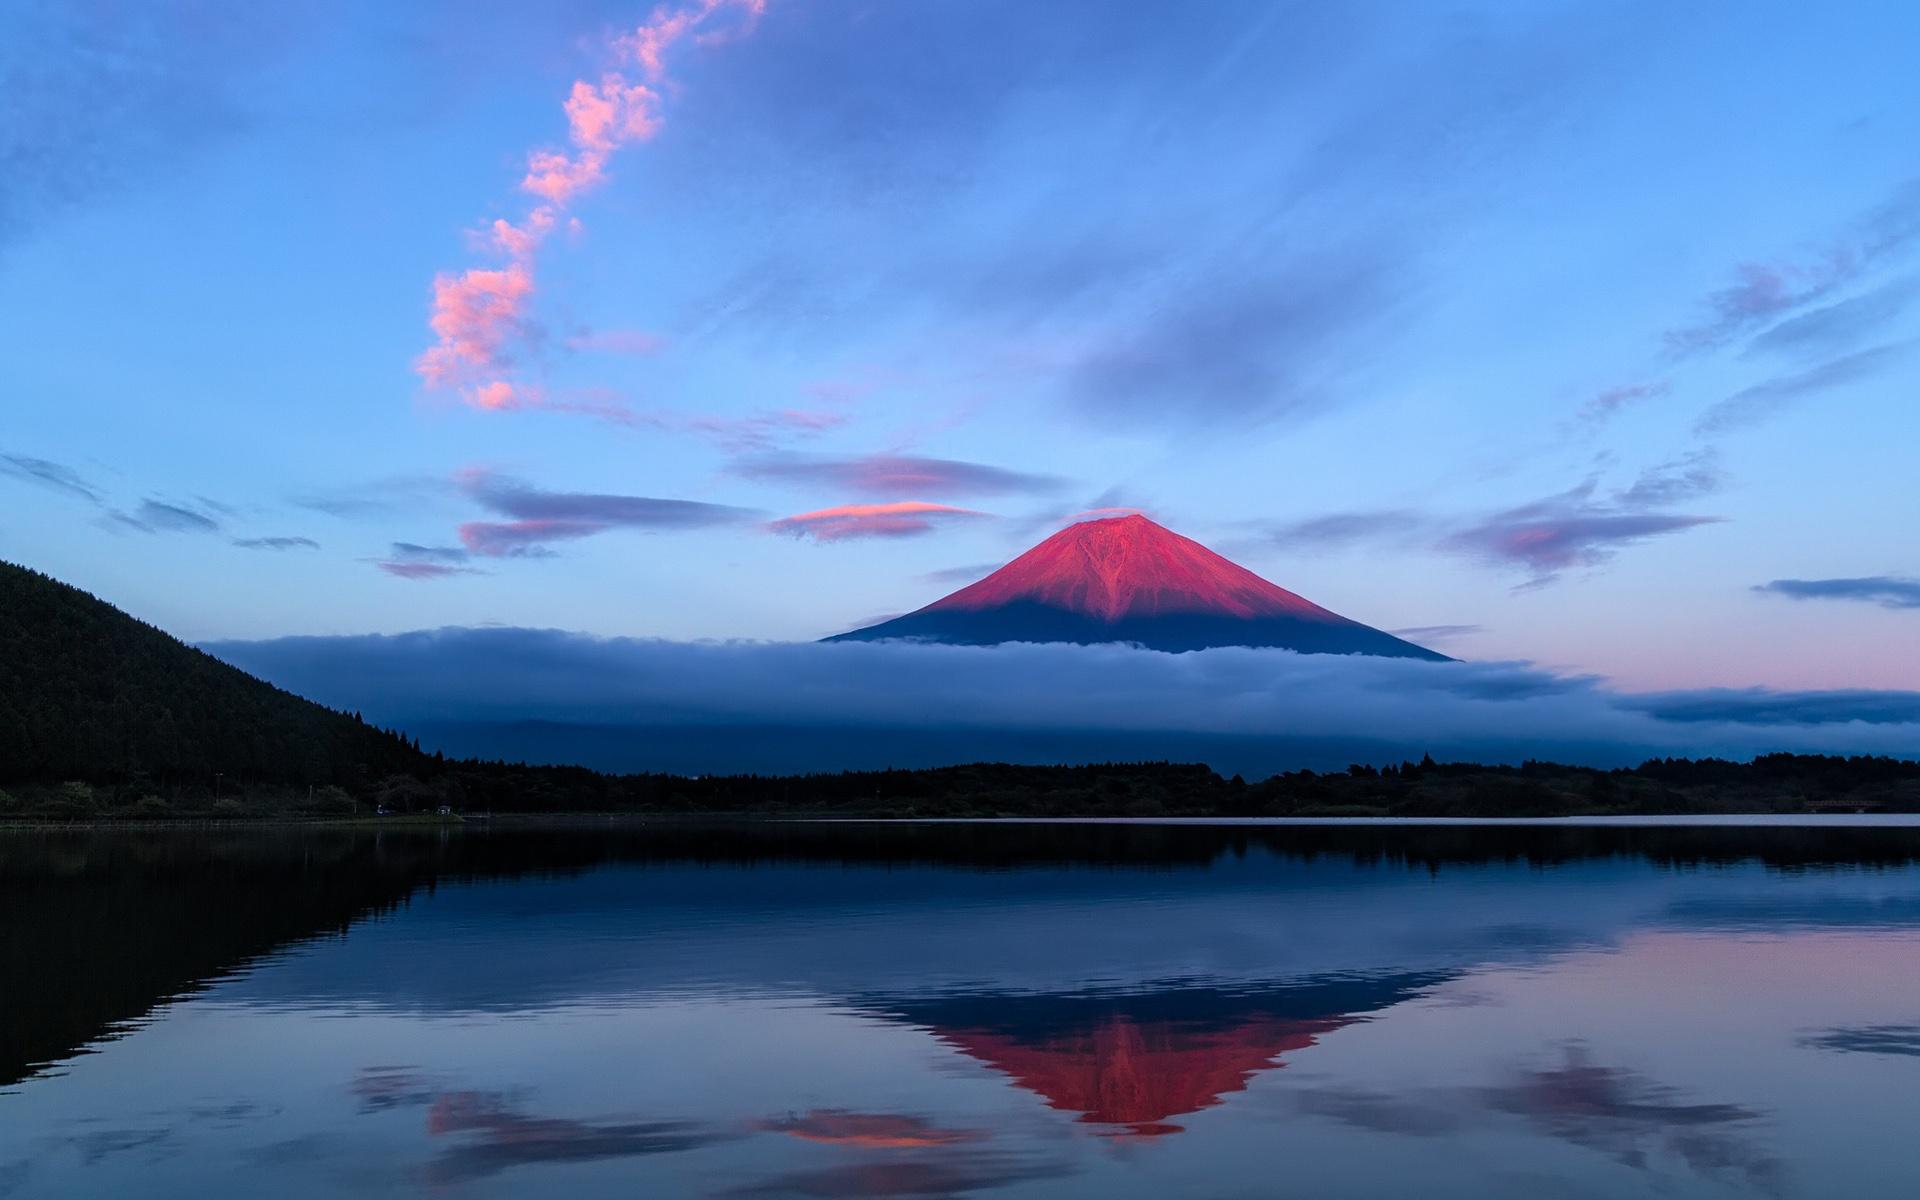 Wallpaper Japan Fuji Mountain Evening Sky Lake Reflection Blue 19x10 Hd Picture Image